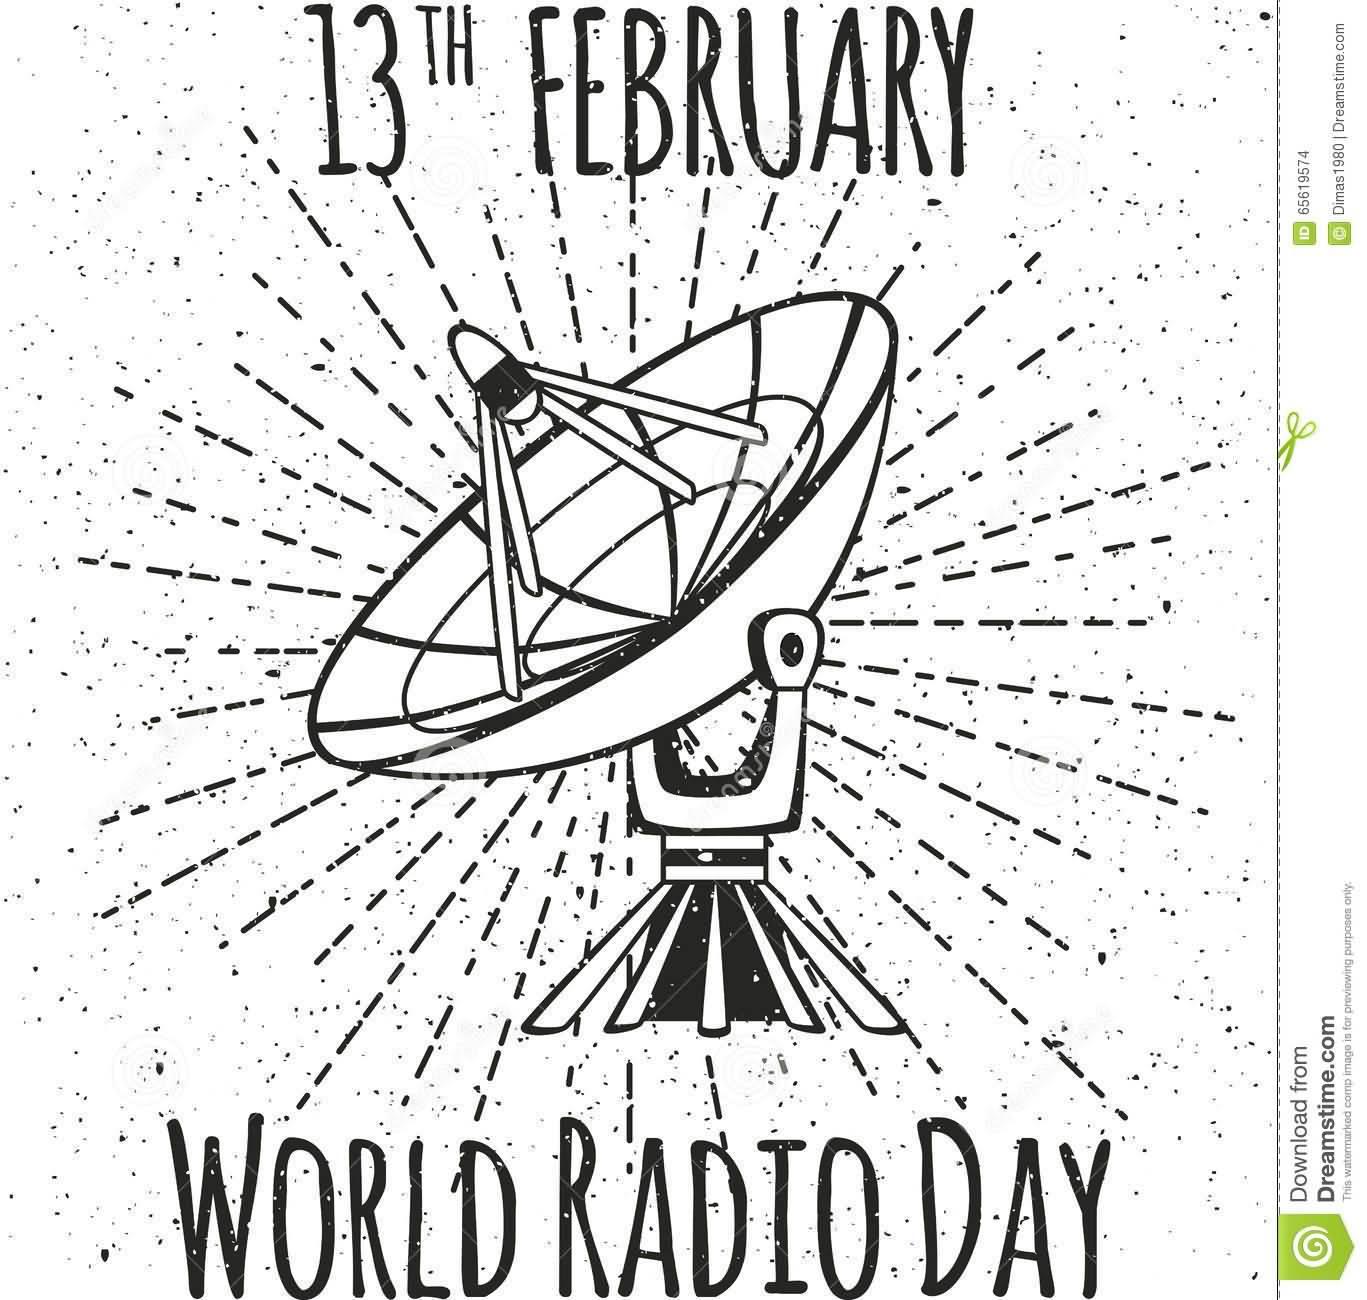 13th February World Radio Day